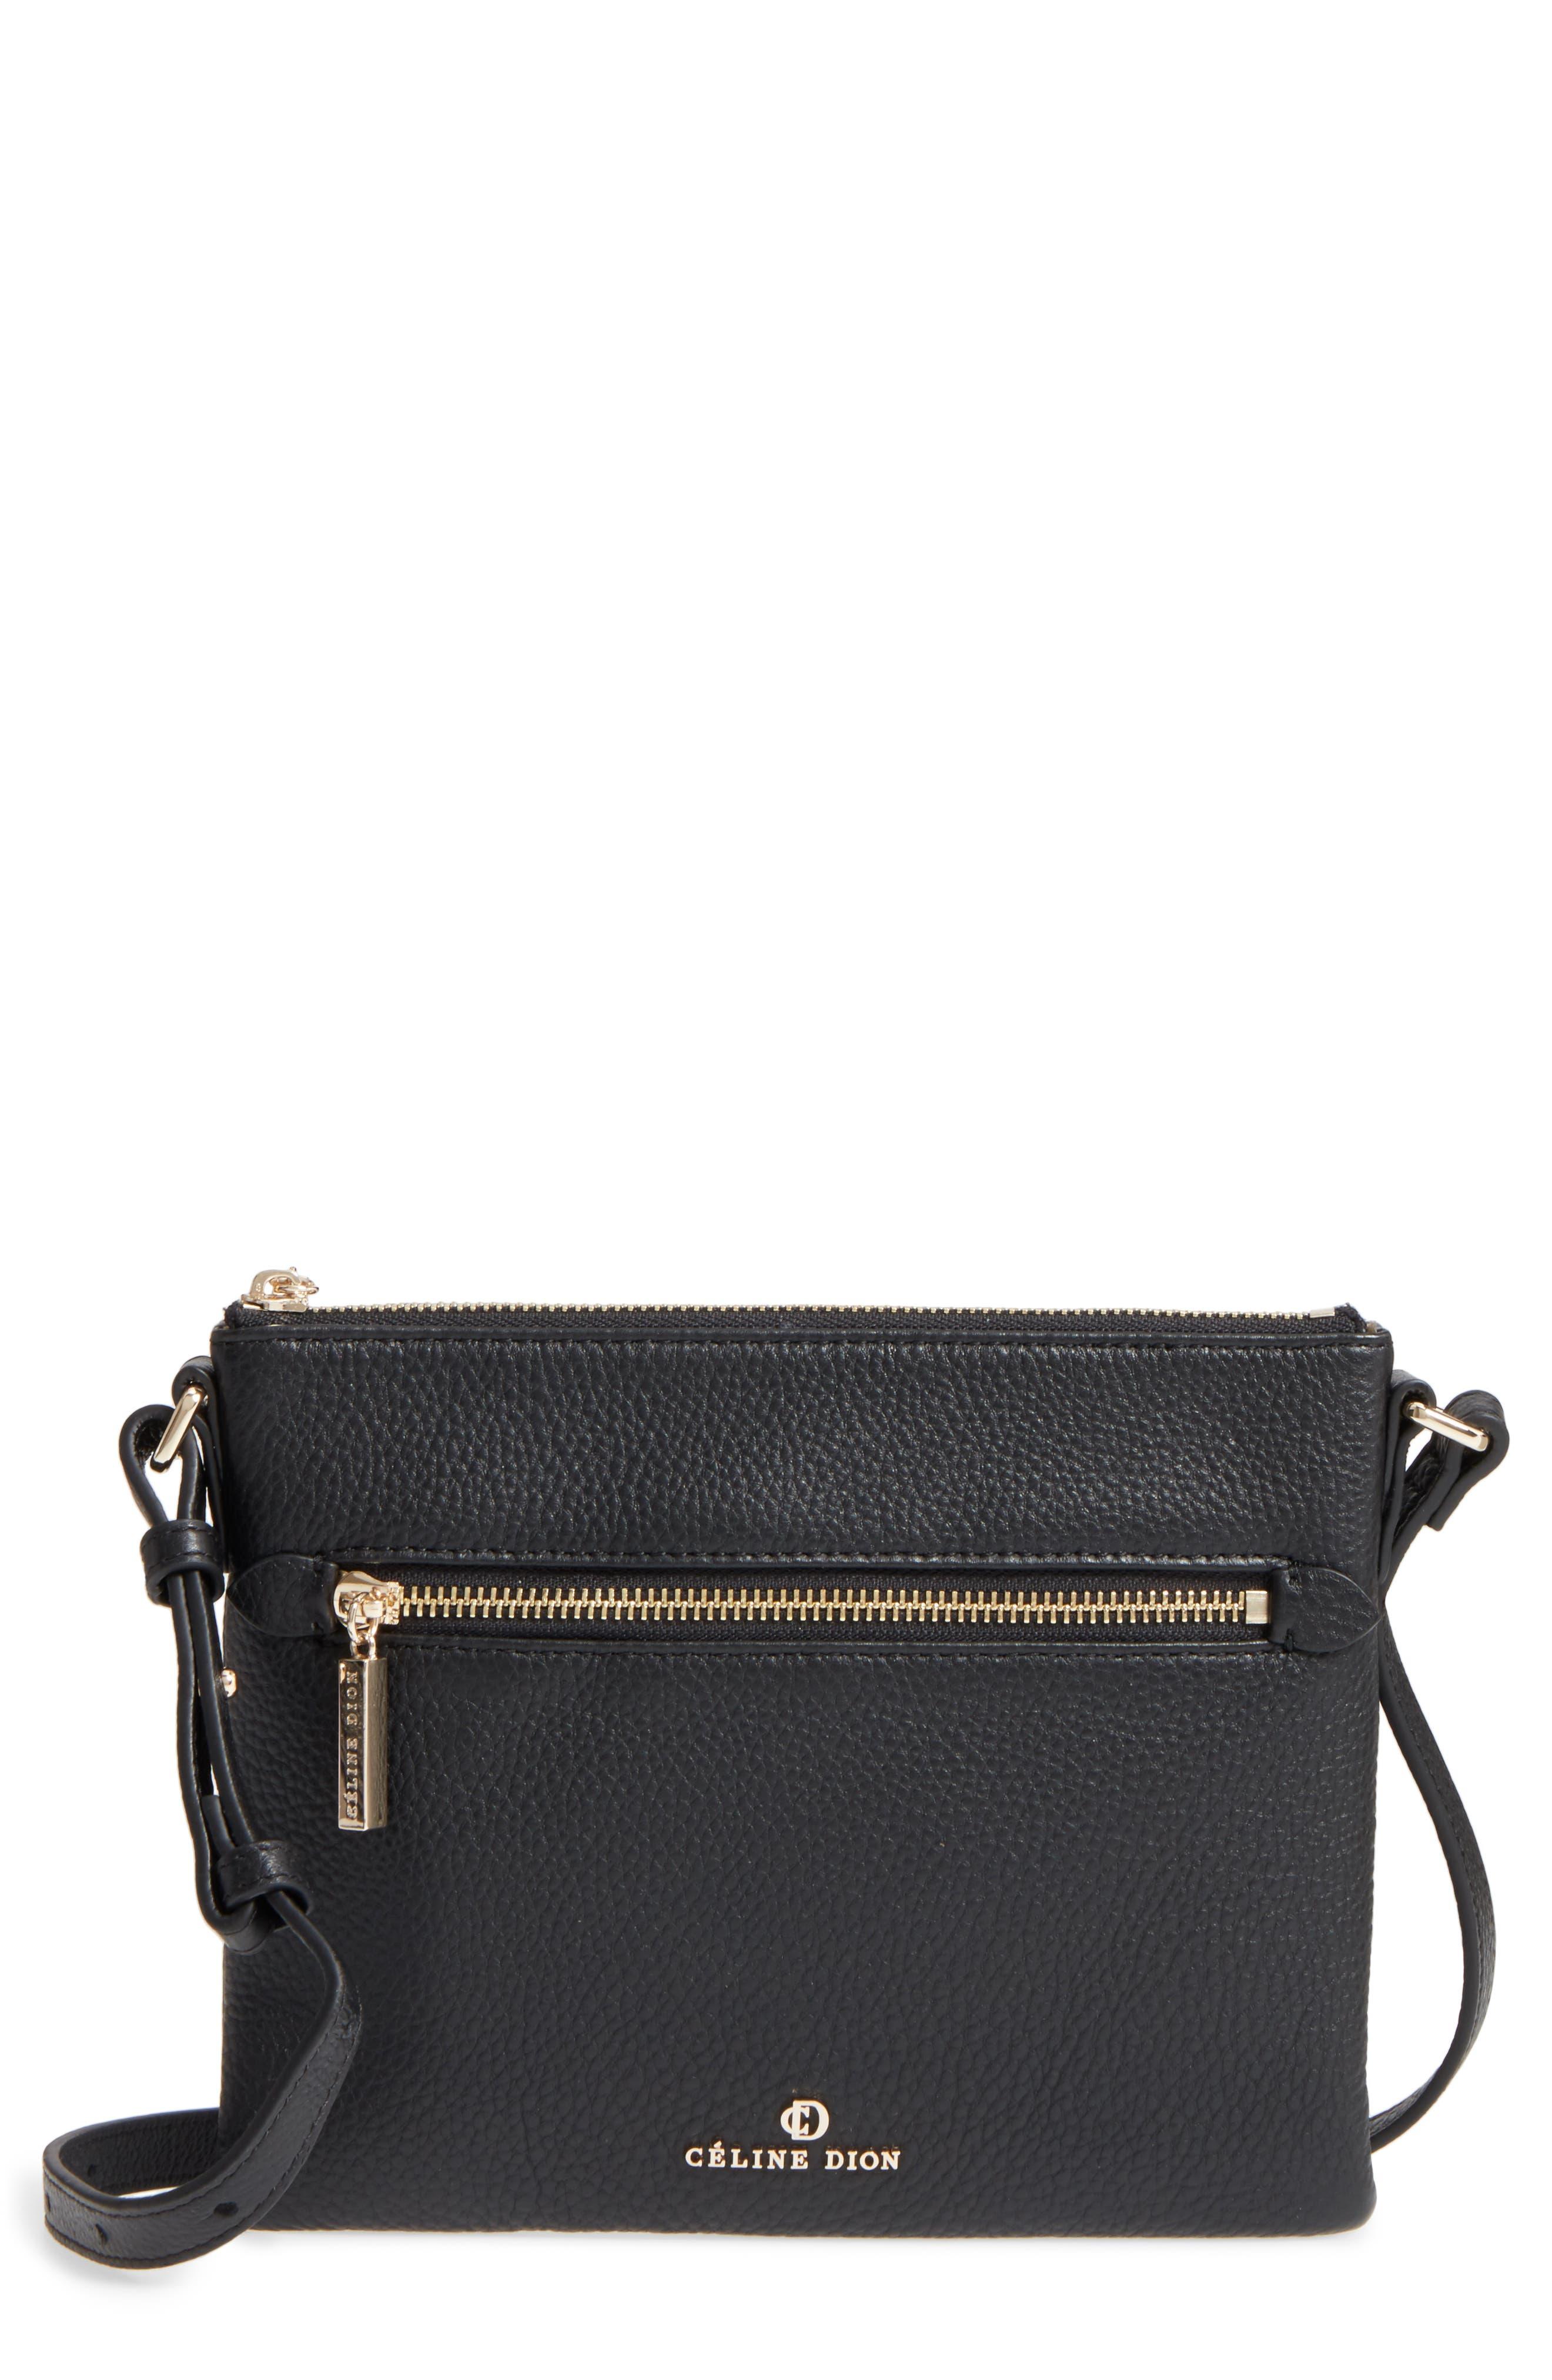 Céline Dion Adagio Leather Crossbody Bag,                         Main,                         color, 001